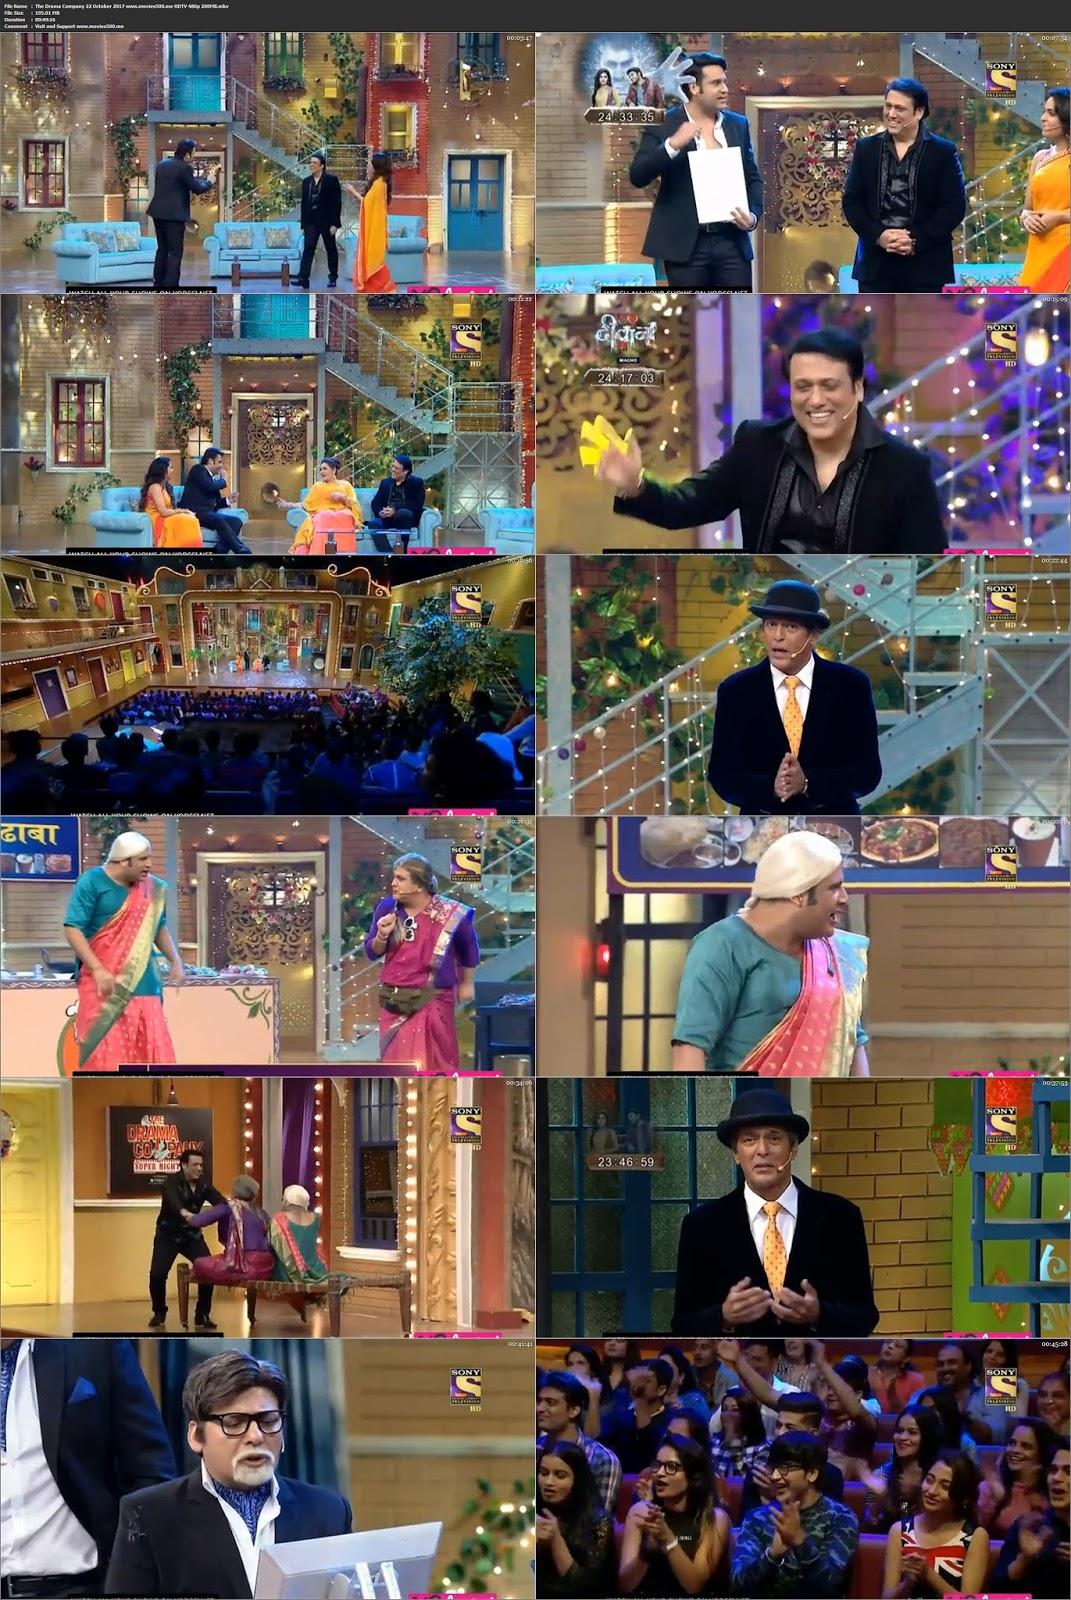 The Drama Company 22 October 2017 Full Show 195MB HDTV 480p at lucysdoggrooming.com